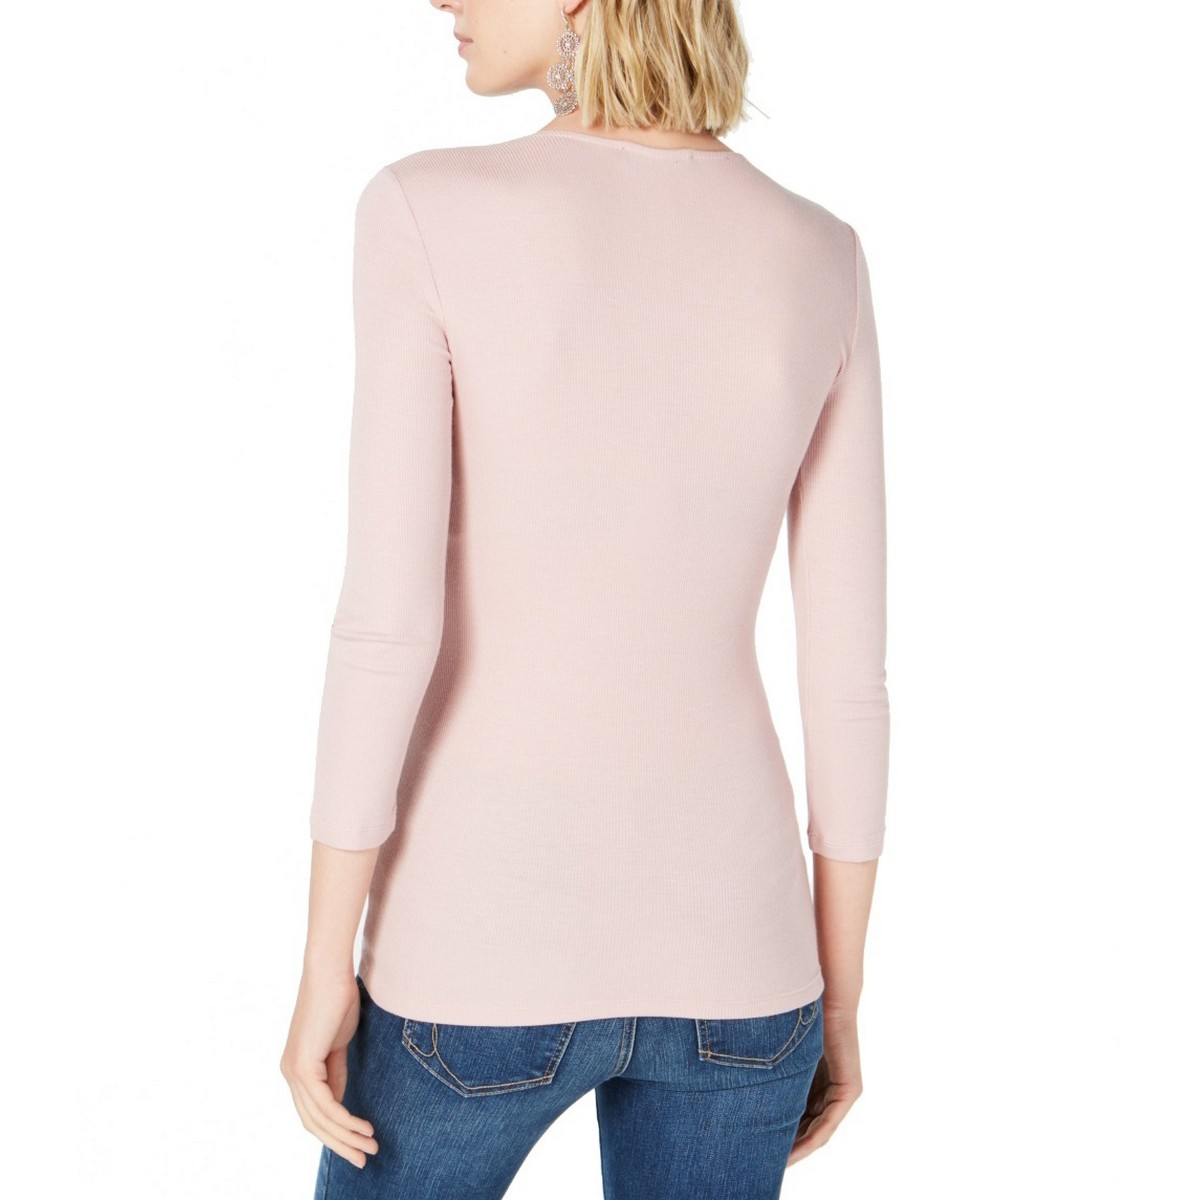 INC-NEW-Women-039-s-Ribbed-V-neck-Blouse-Shirt-Top-TEDO thumbnail 5